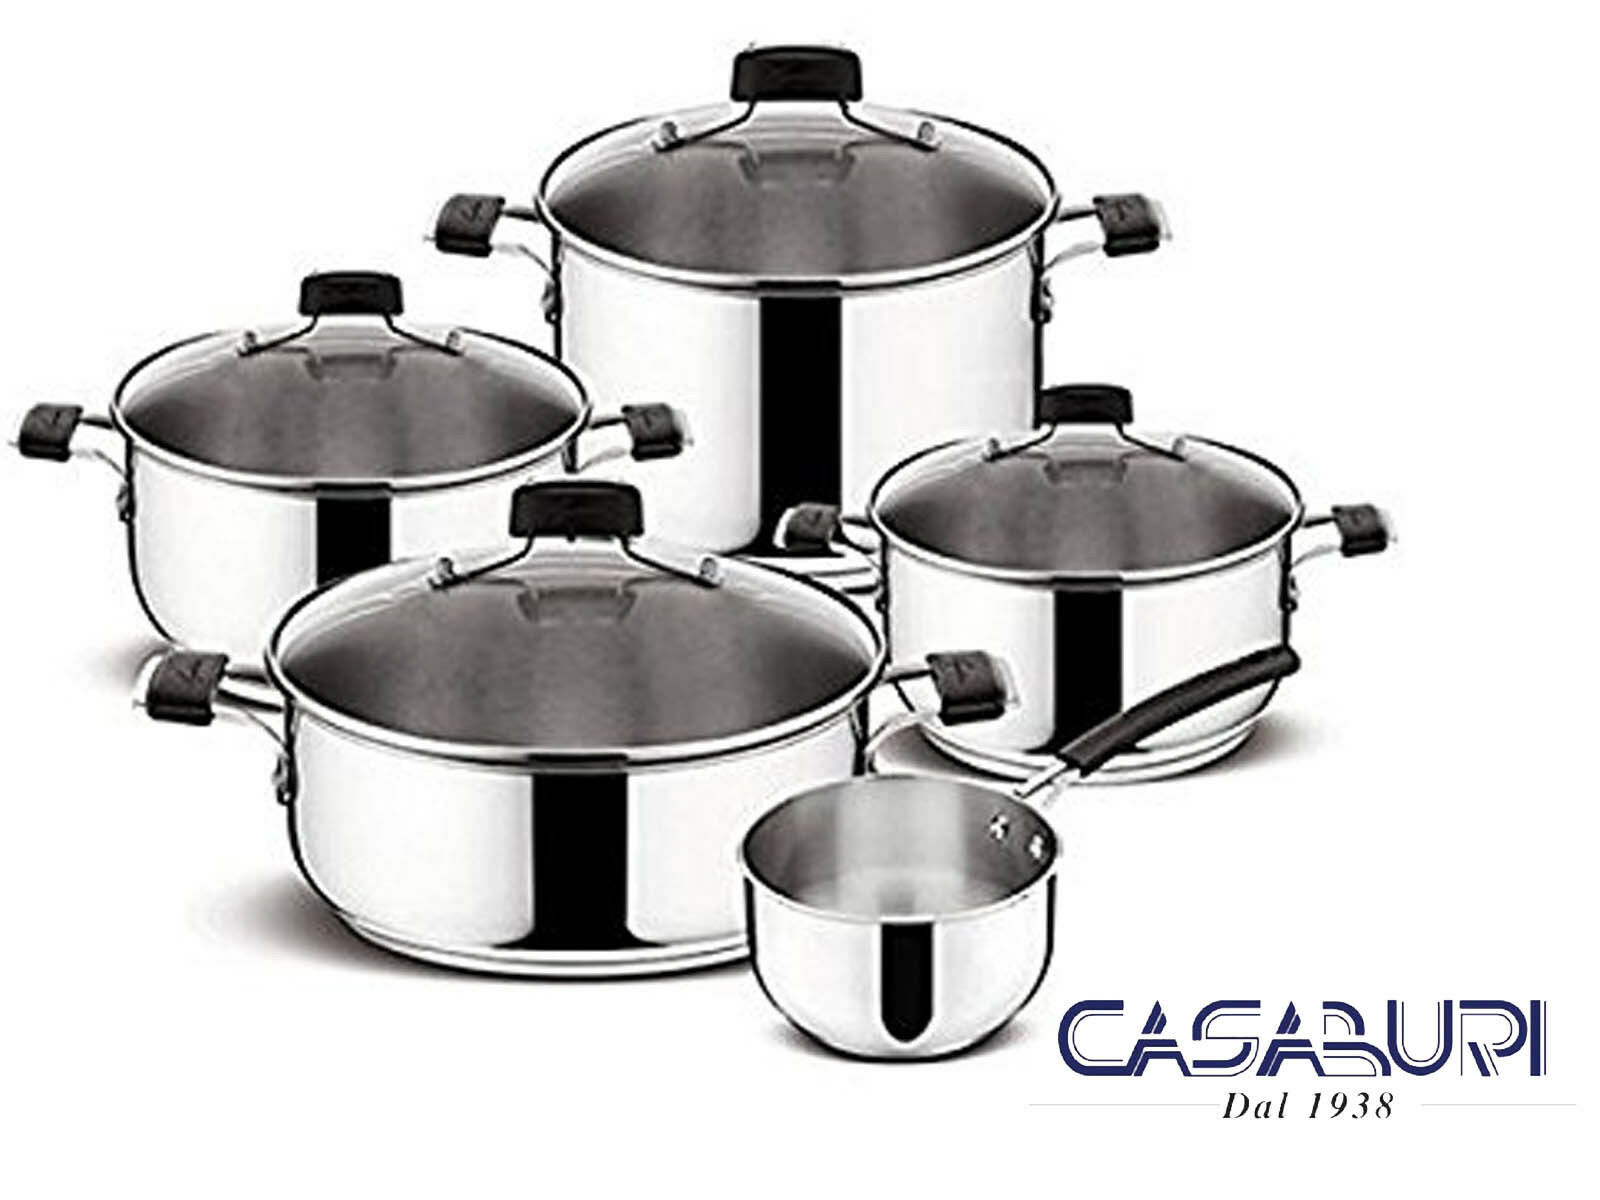 Lagostina Batteria di Pentole Tempra 9 Pz in Acciaio Inox - Cookware Set